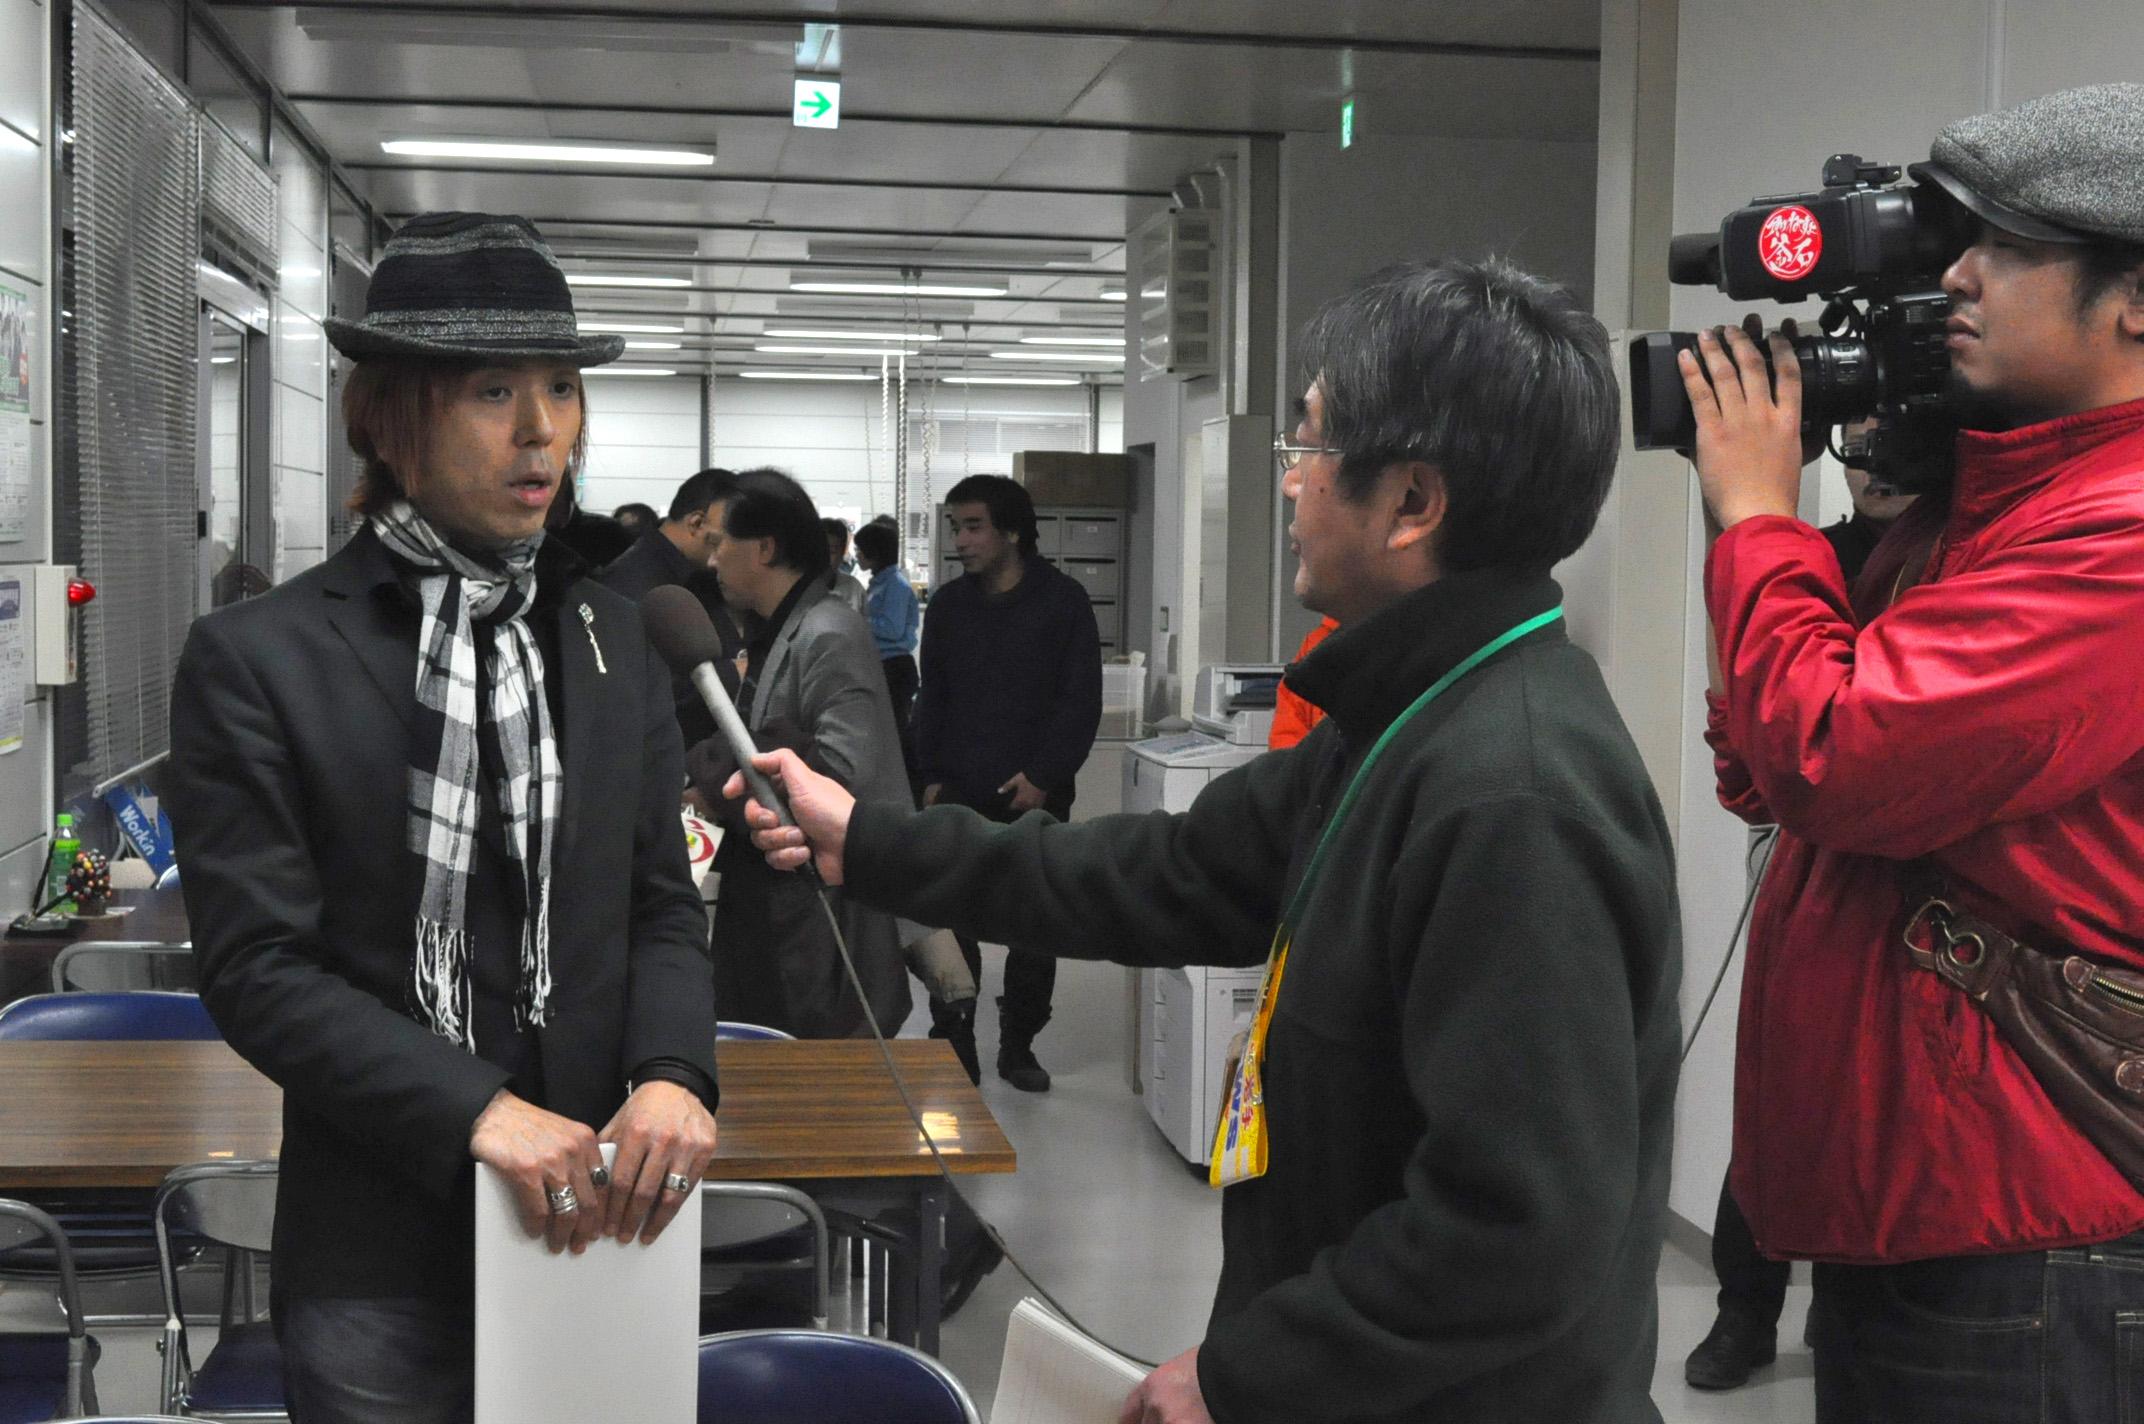 http://www.kickbackcafe.jp/support2/report/lllll.jpg